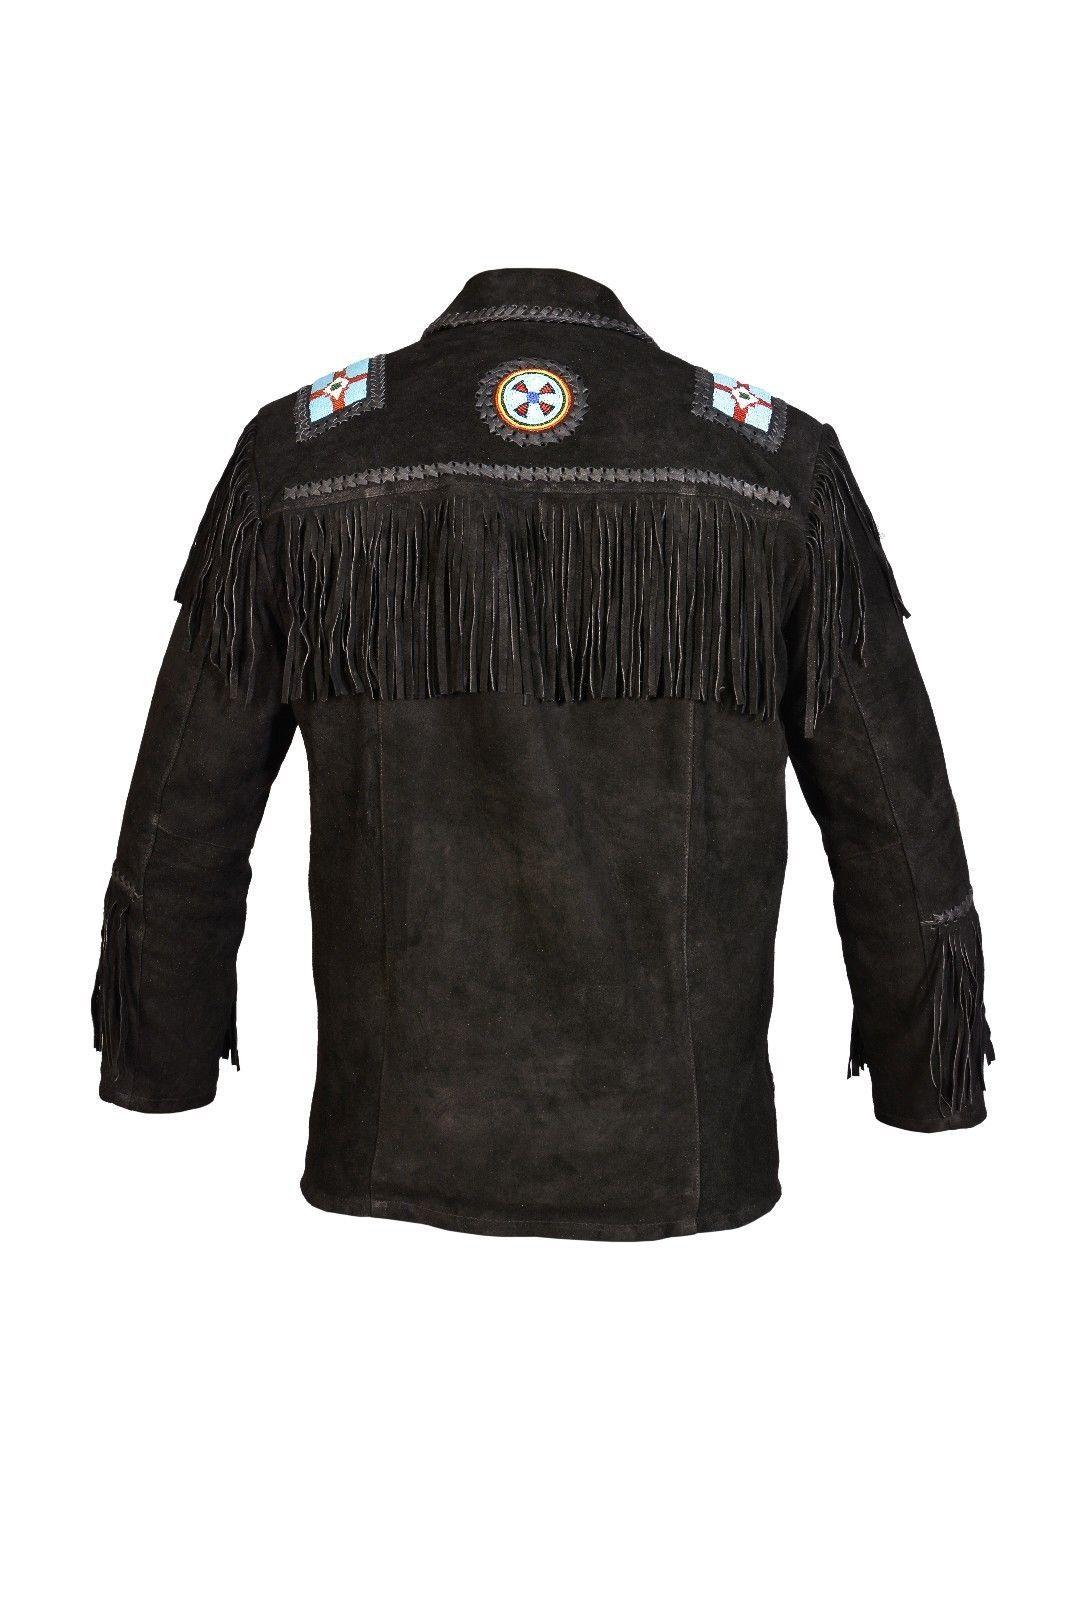 Men New Native American Buckskin Black Goat Suede Leather Bead Shirt & Pant WS69 image 5